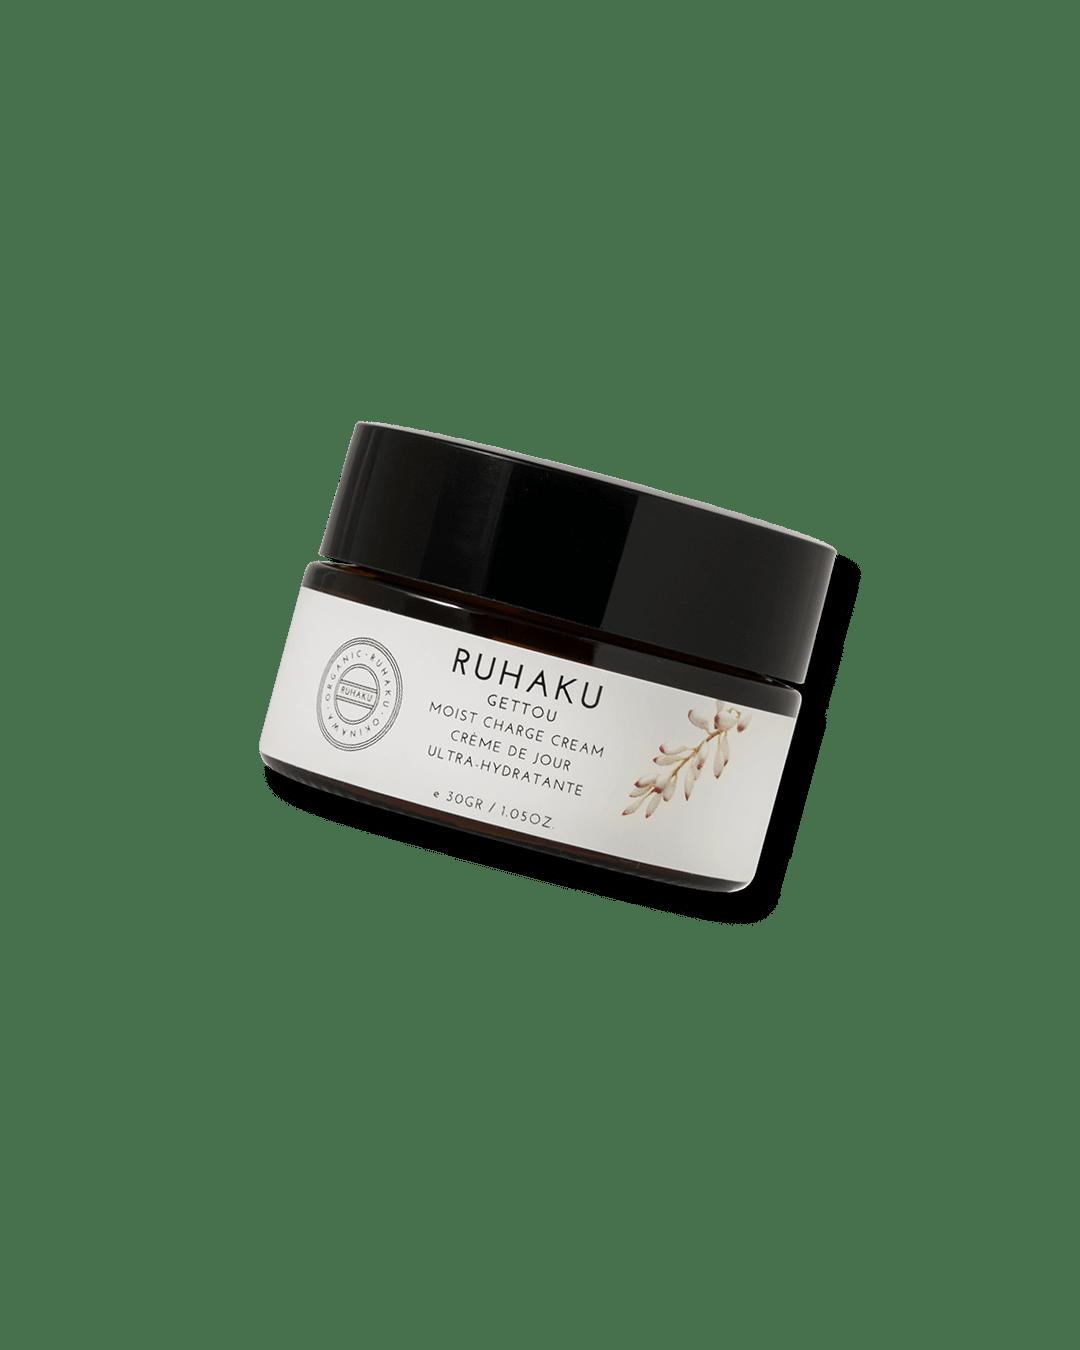 Moist Charge Cream